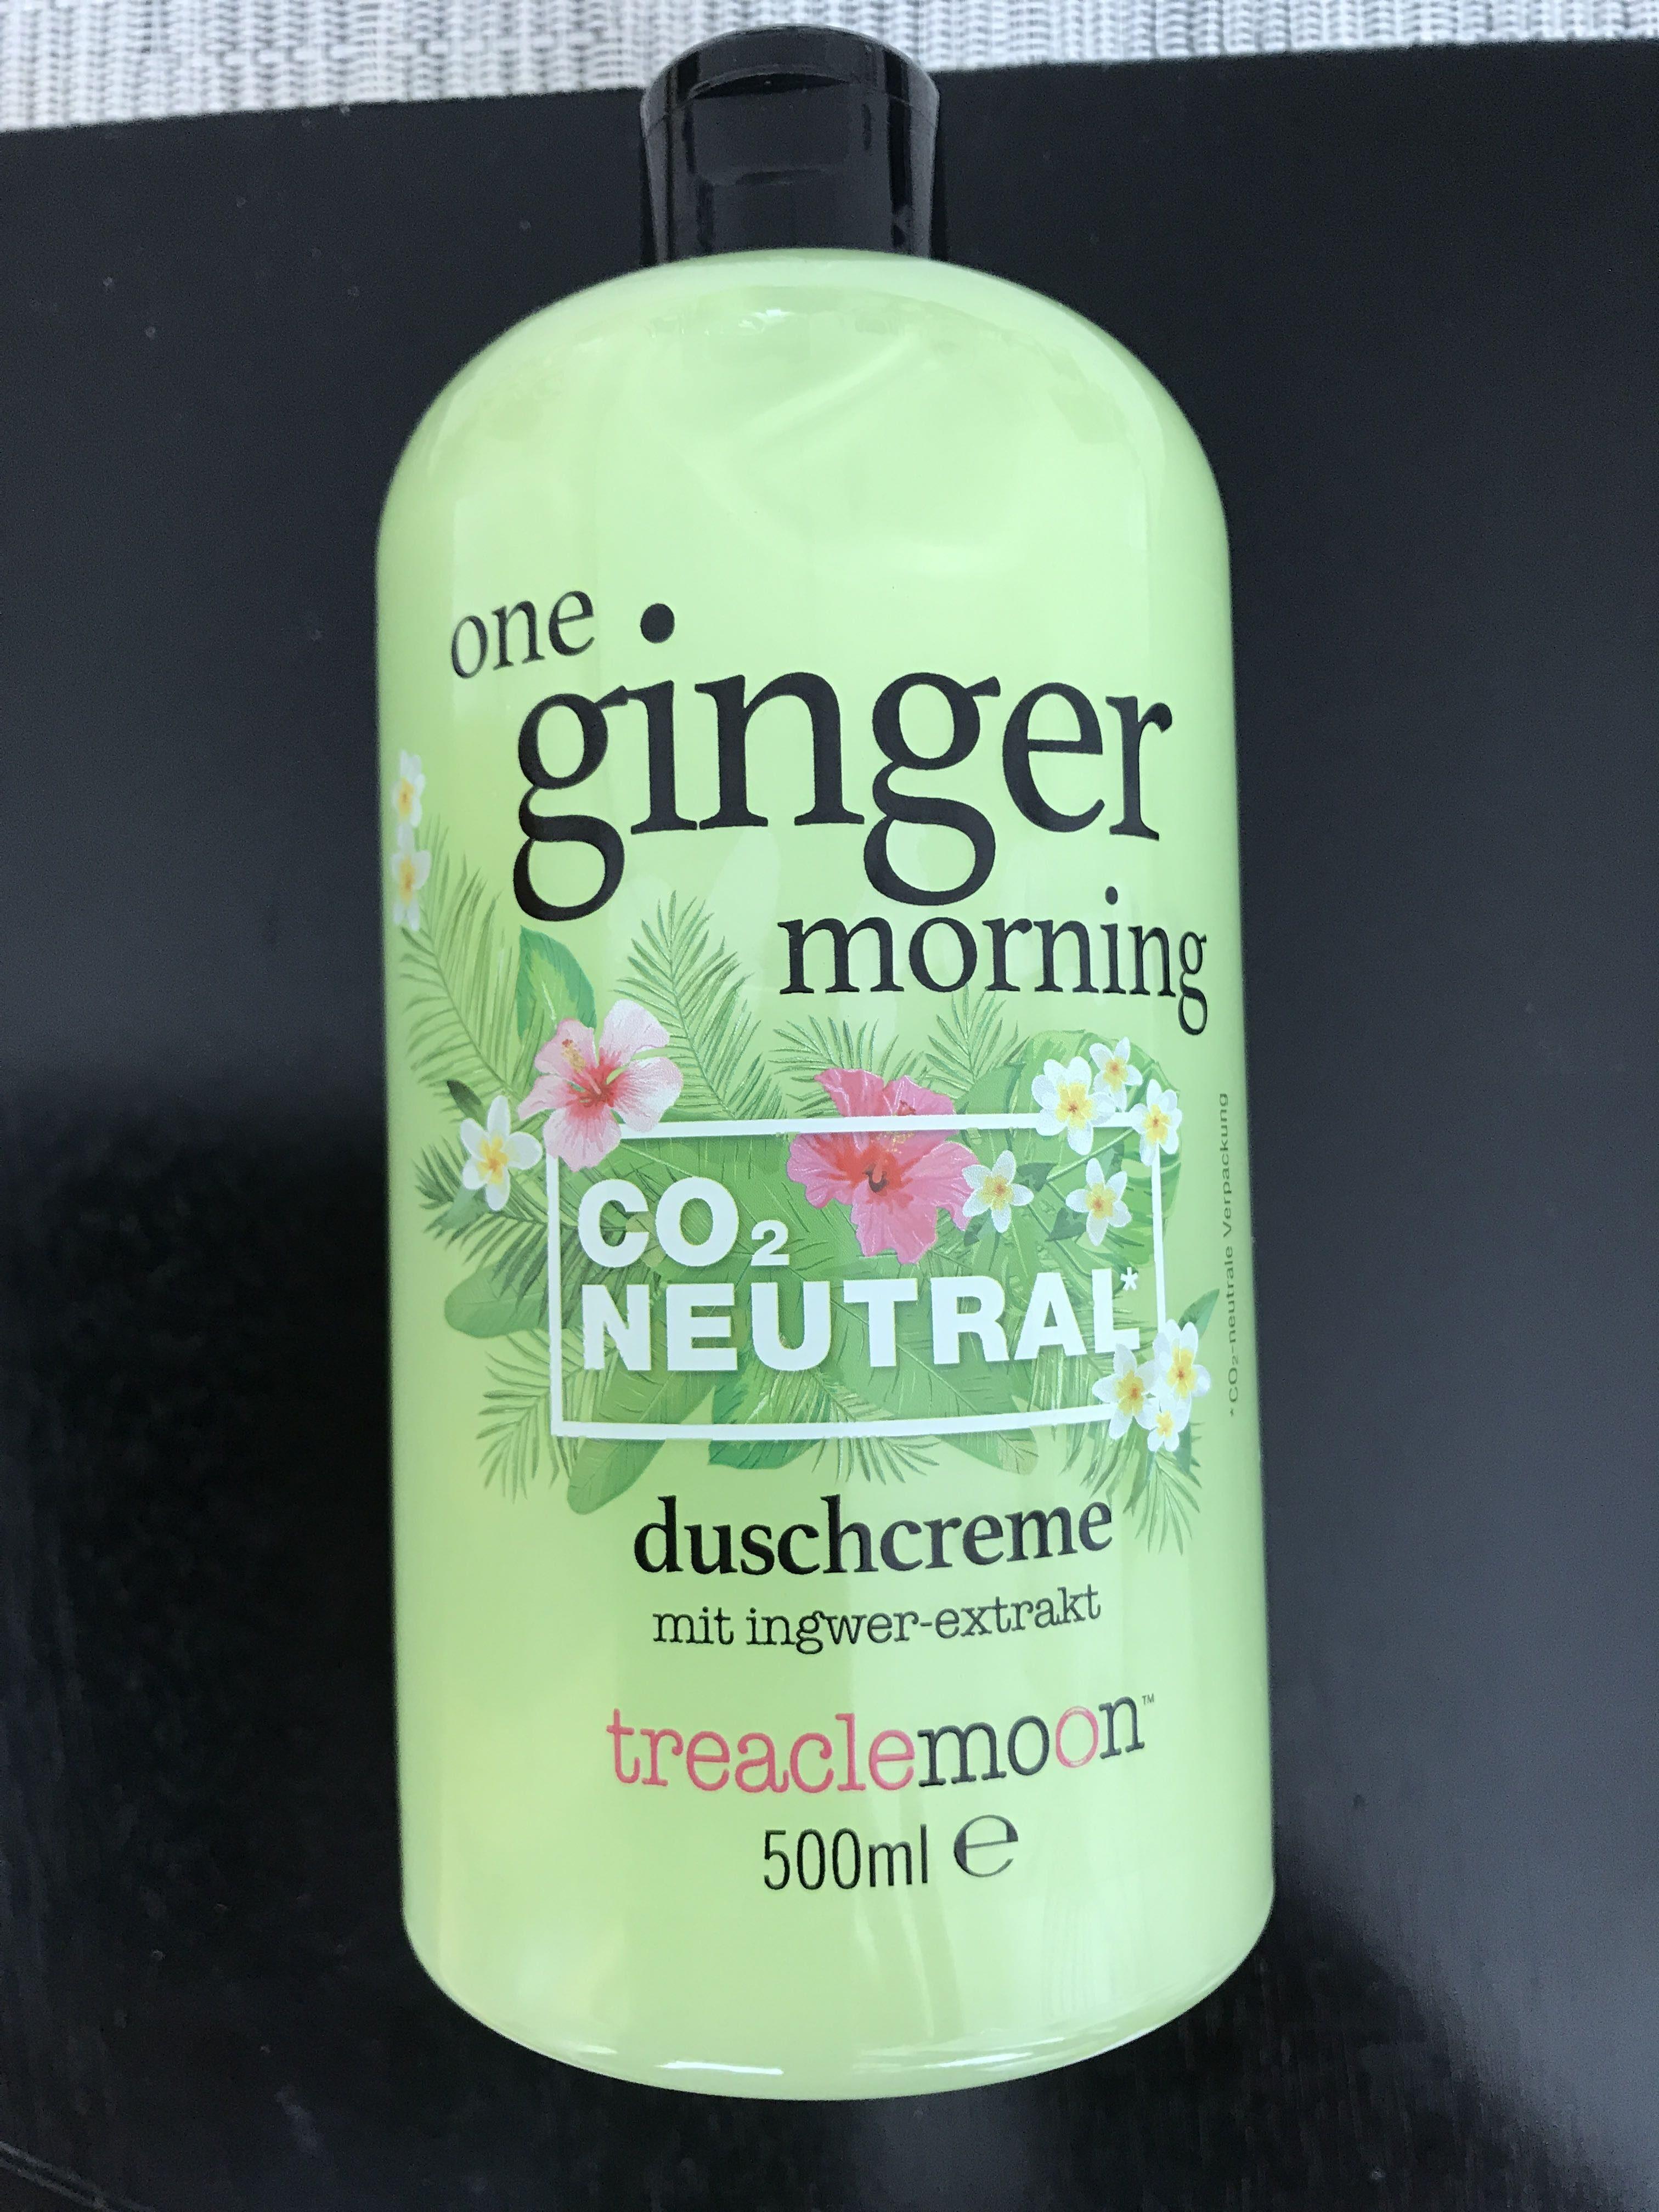 One ginger morning - Product - en